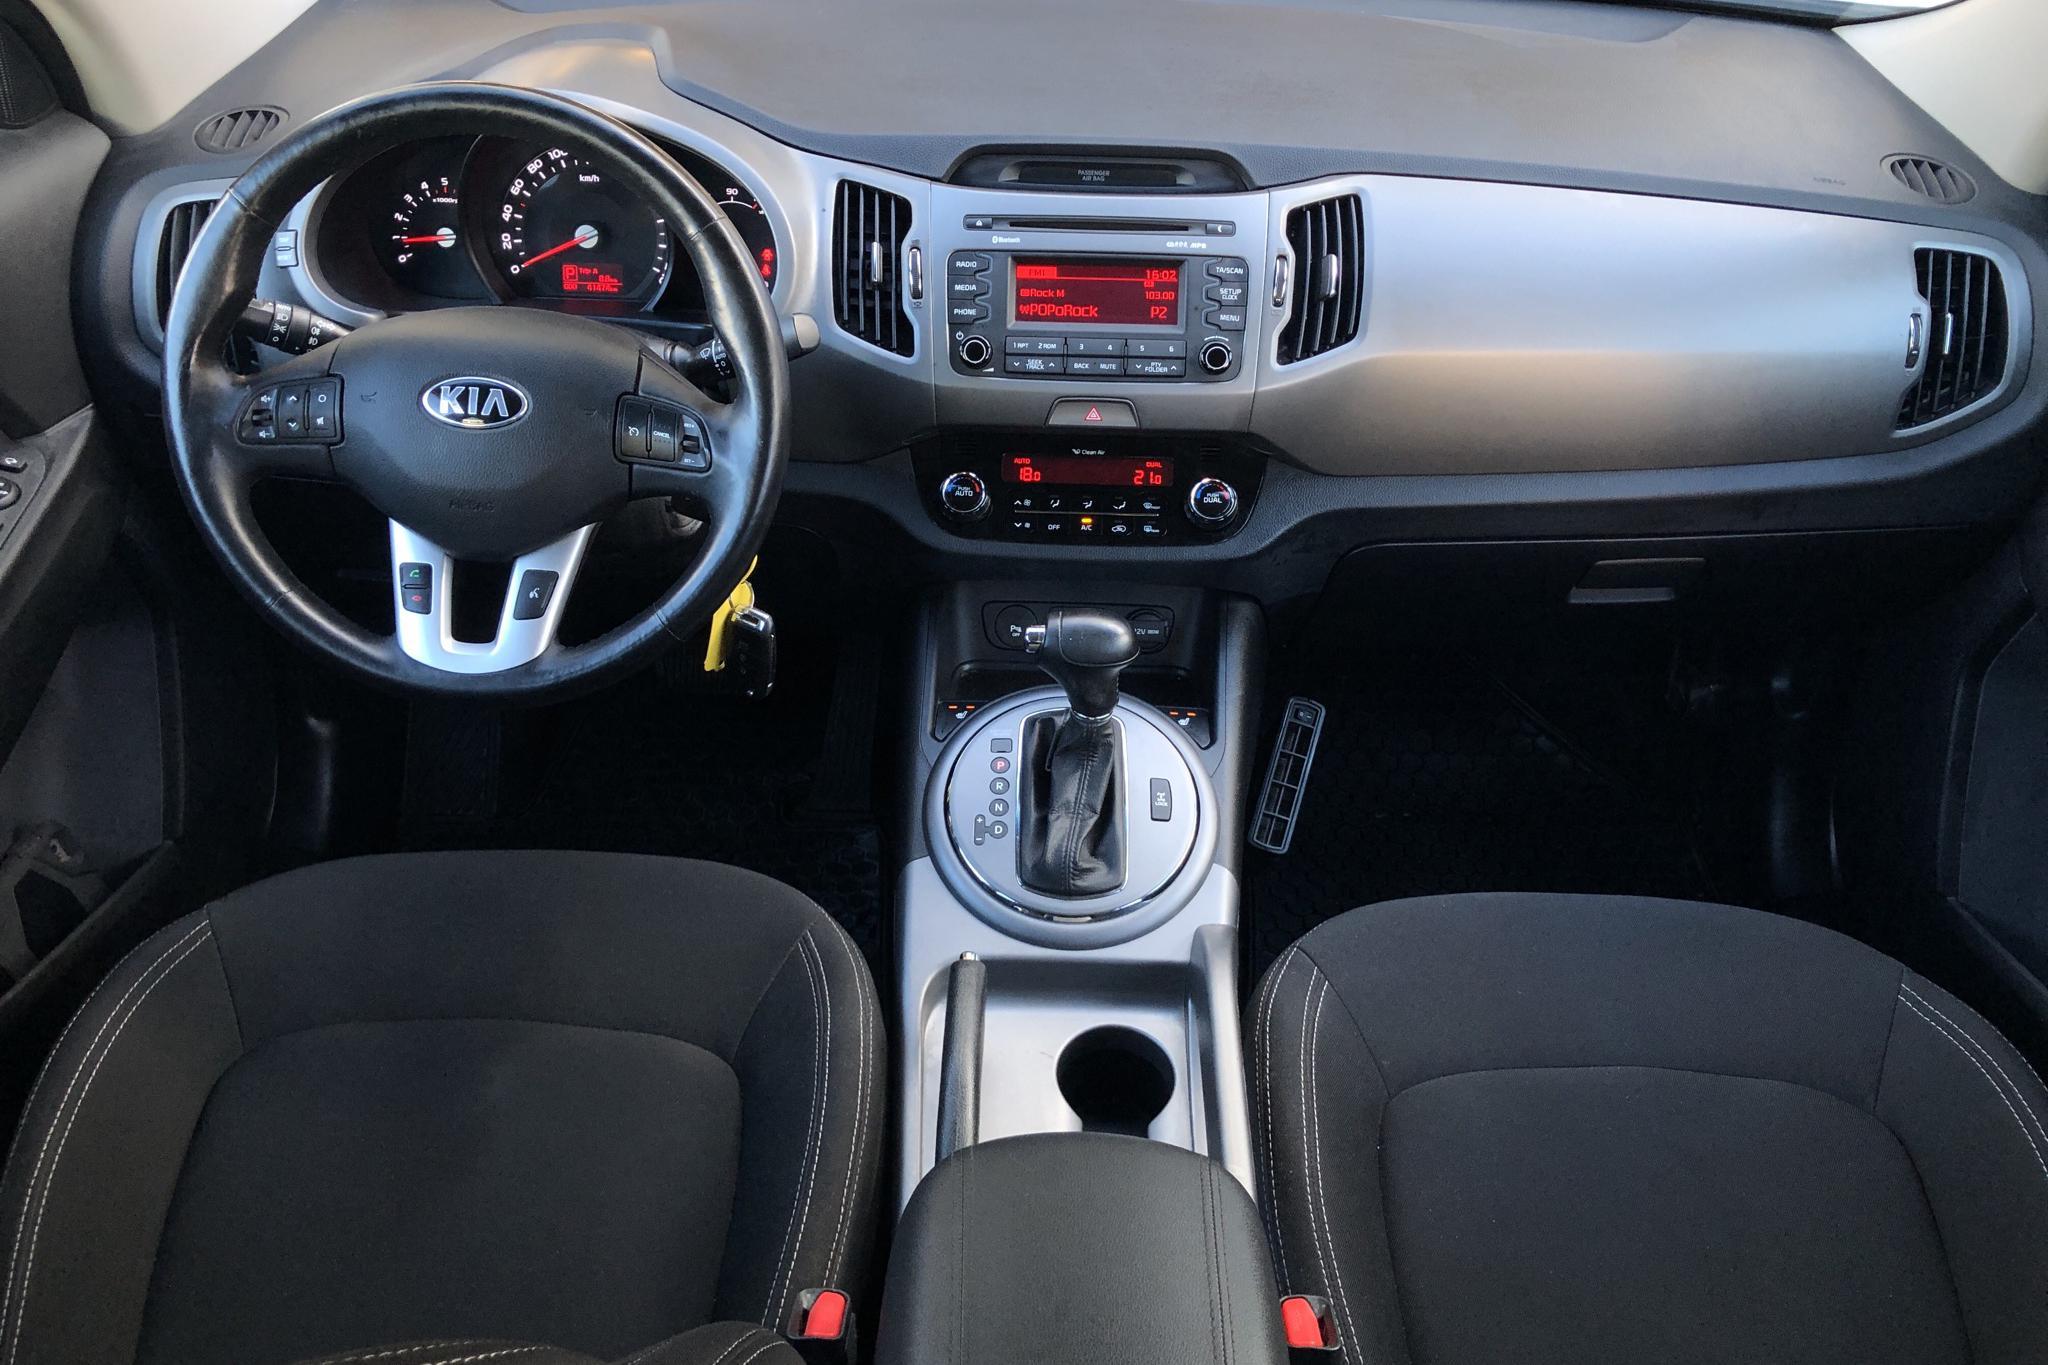 KIA Sportage 2.0 CRDi AWD (184hk) - 41 480 km - Automatic - white - 2015